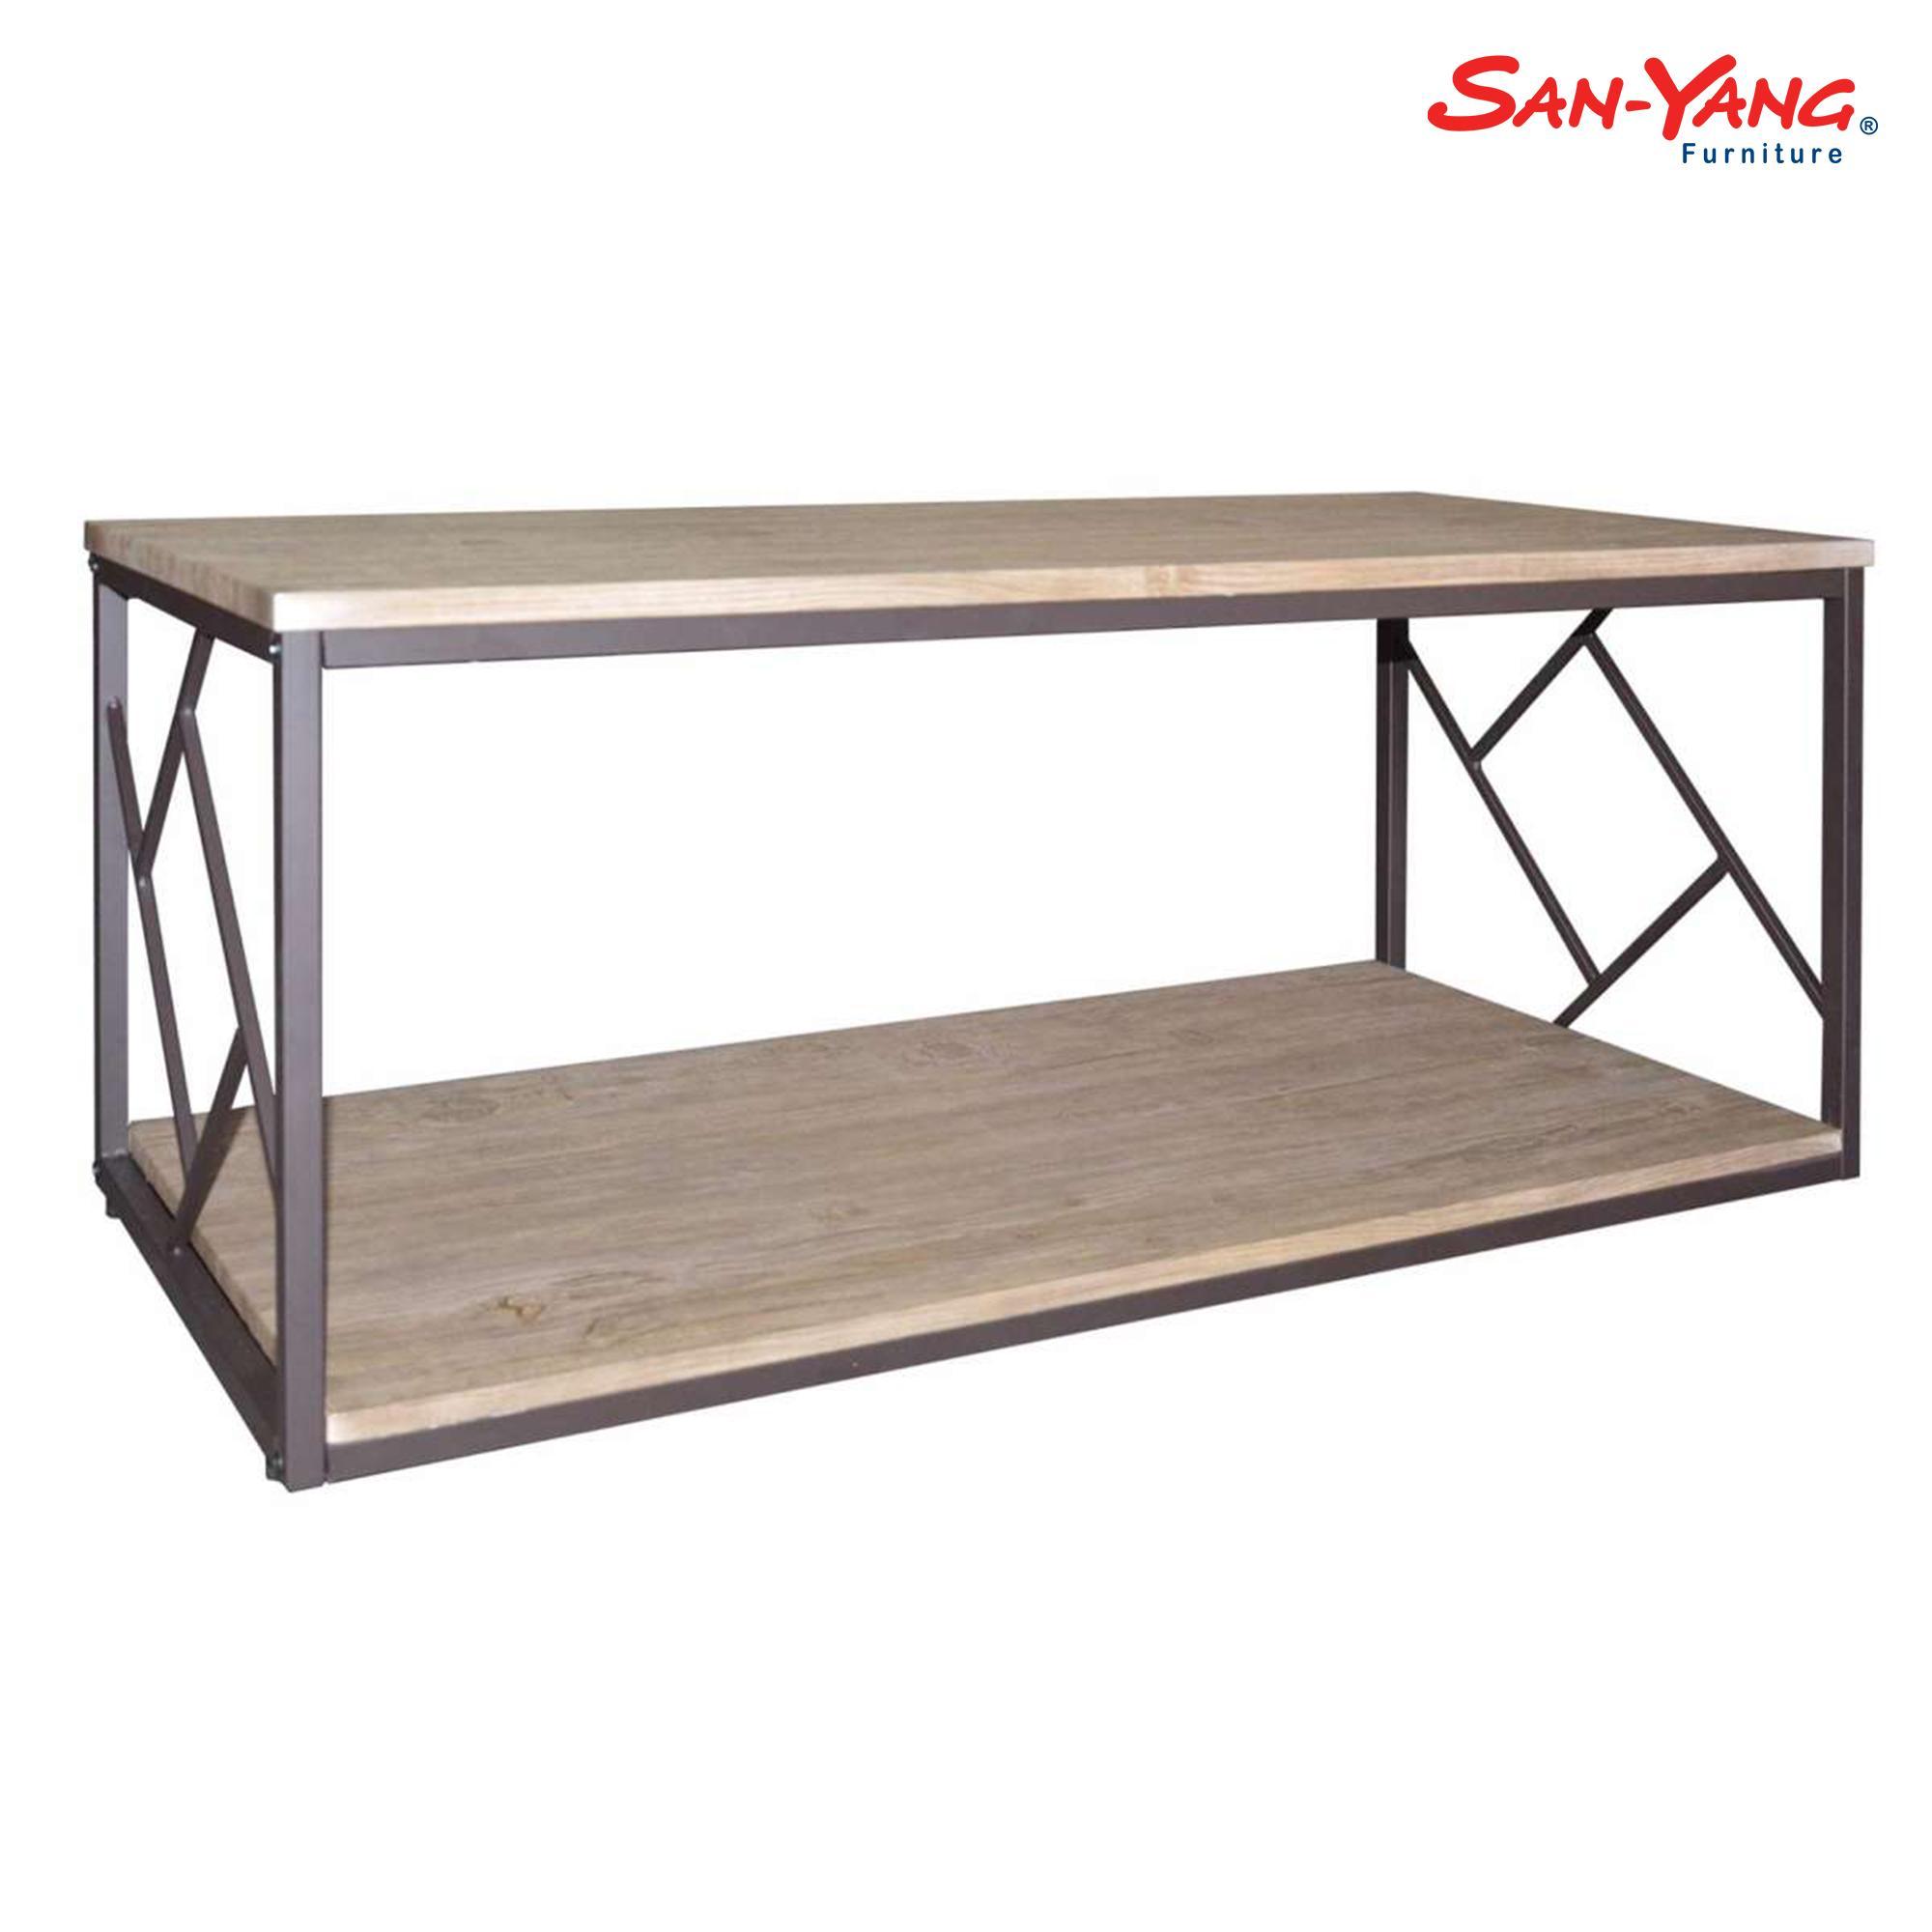 04108af6c21a San-Yang Center   Coffee Table FCT1607